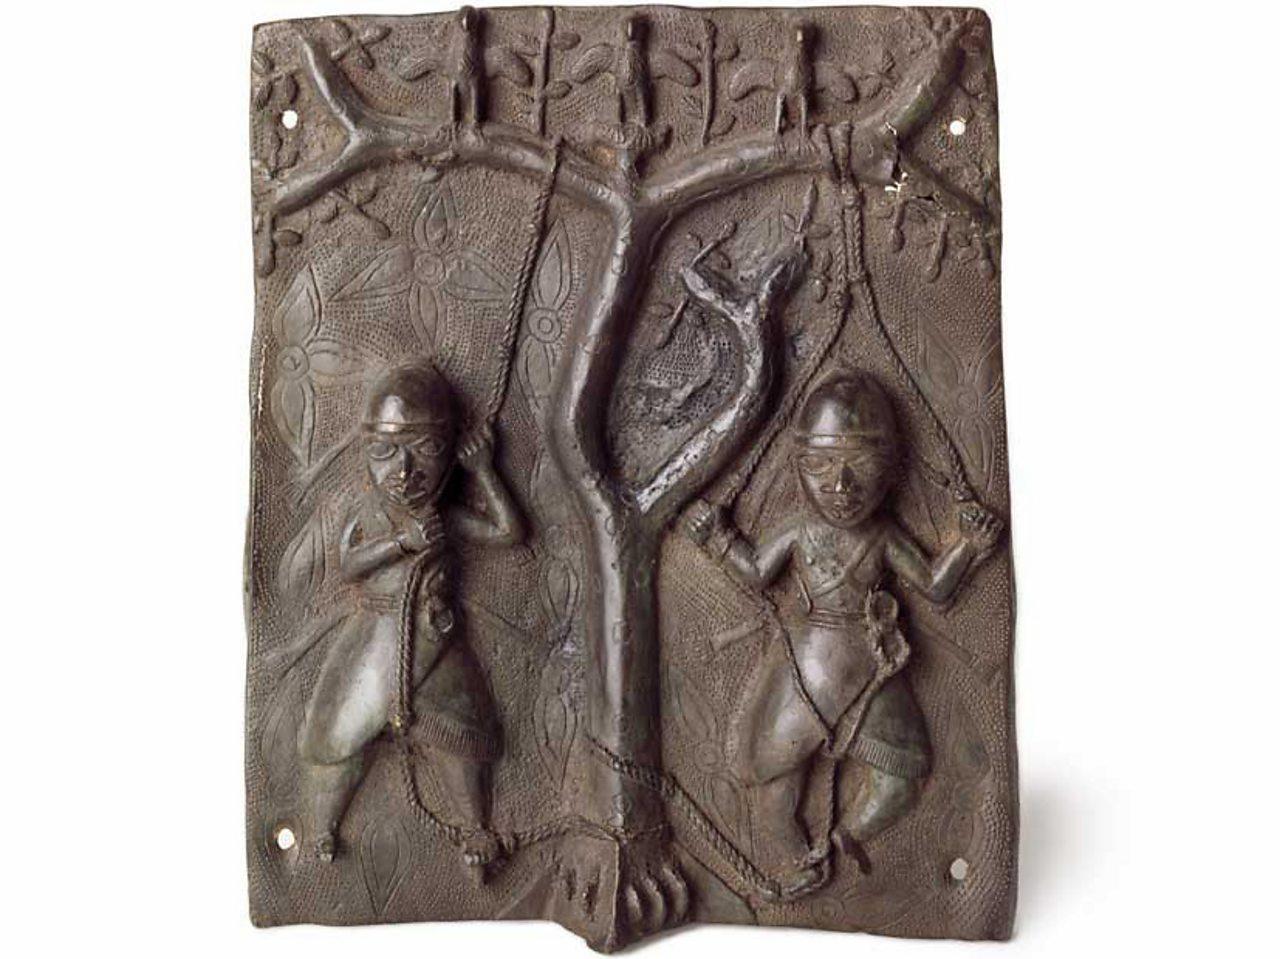 A brass plaque showing acrobats